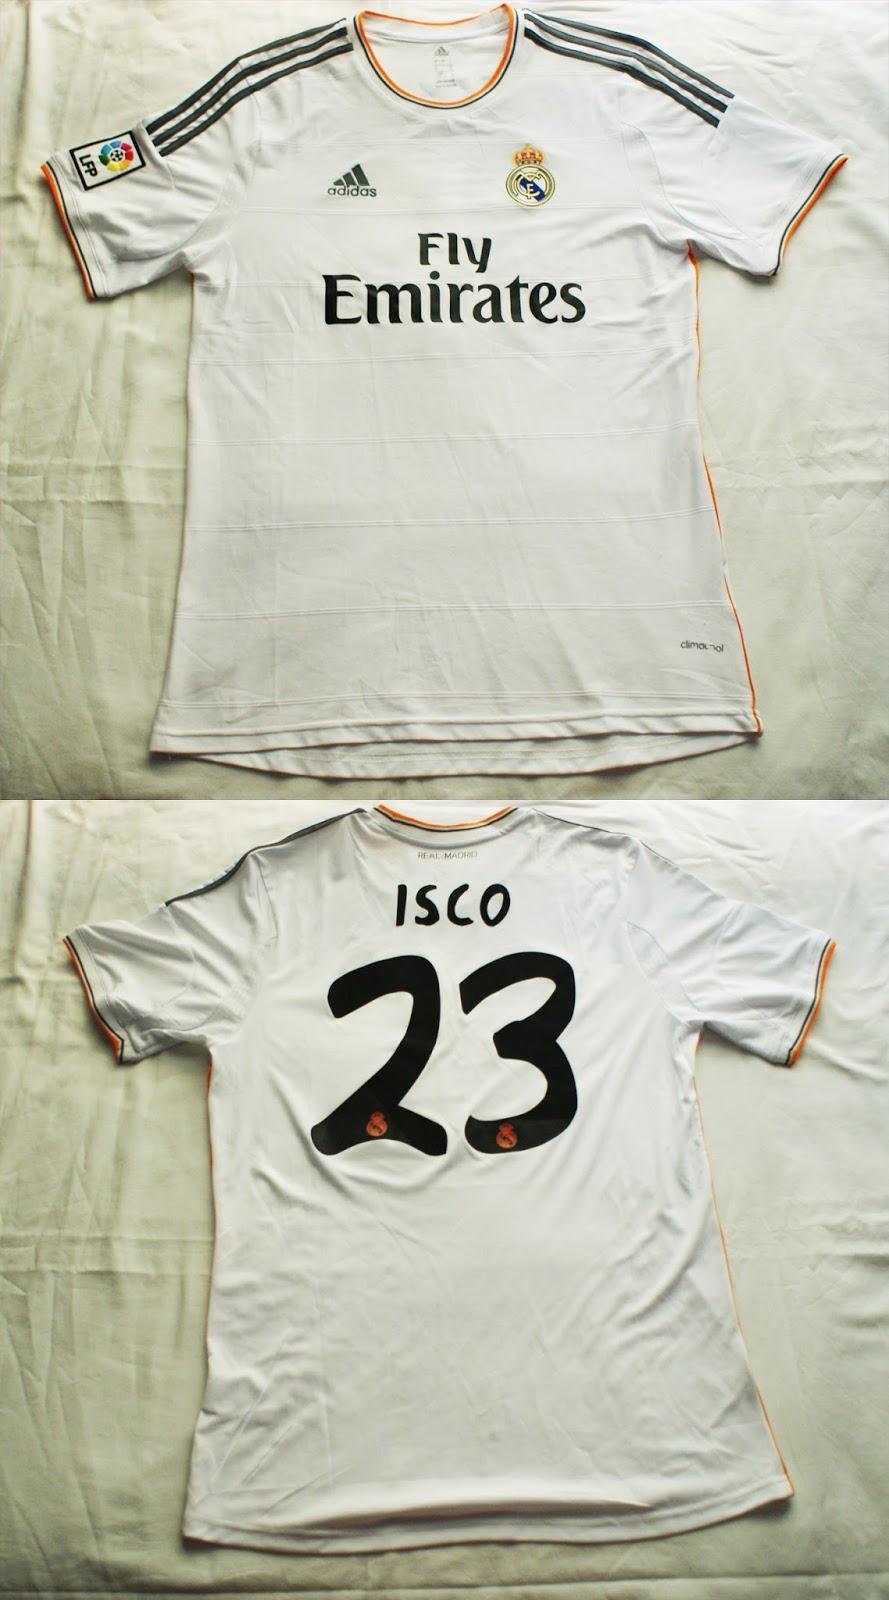 1º Camiseta Real Madrid Club de Fútbol 2013 2014 15acec5ba830f